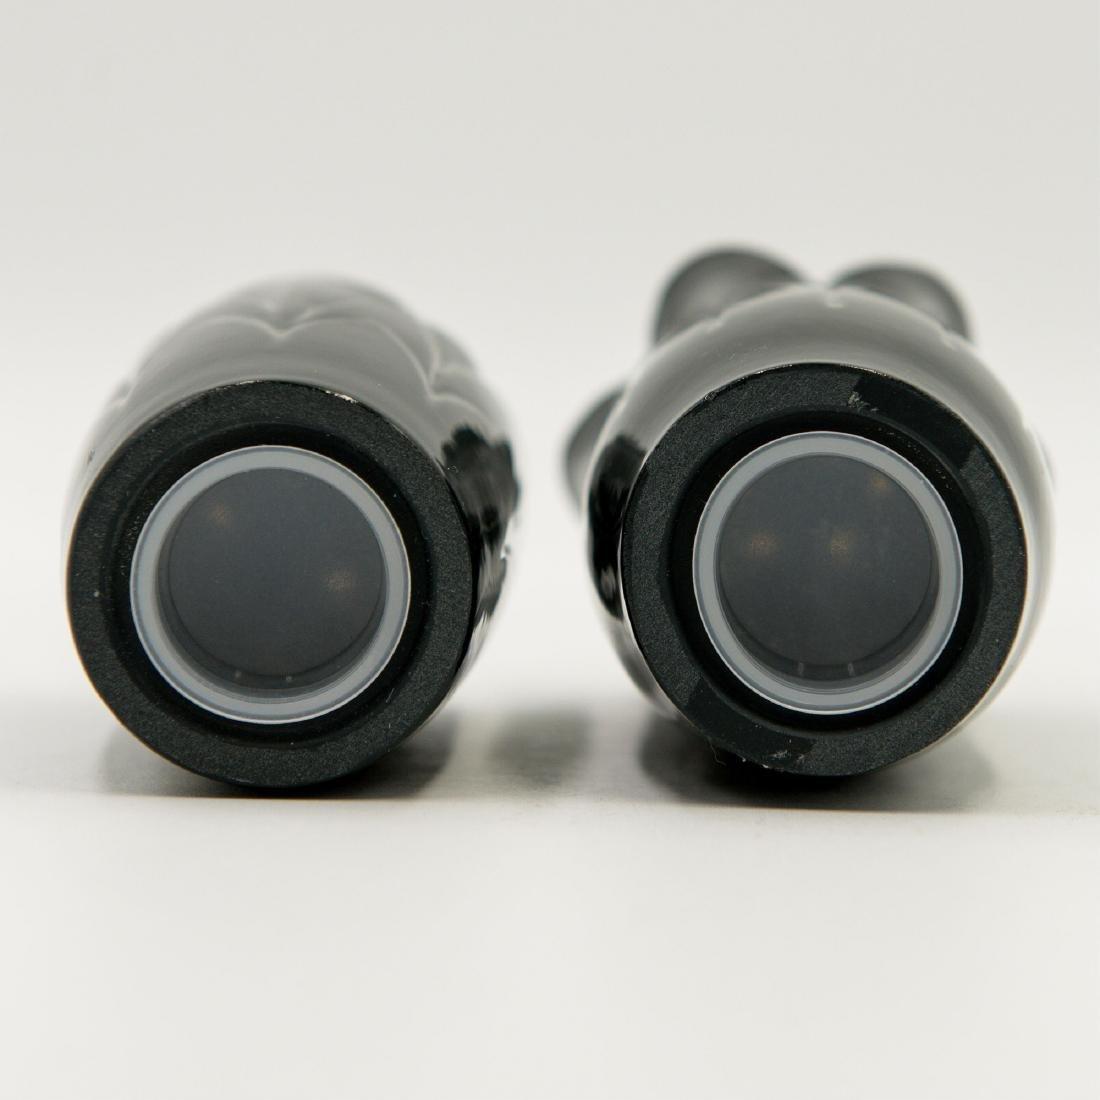 LLADRO NATUROFANTASTIC SALT & PEPPER SHAKERS BLACK - 3